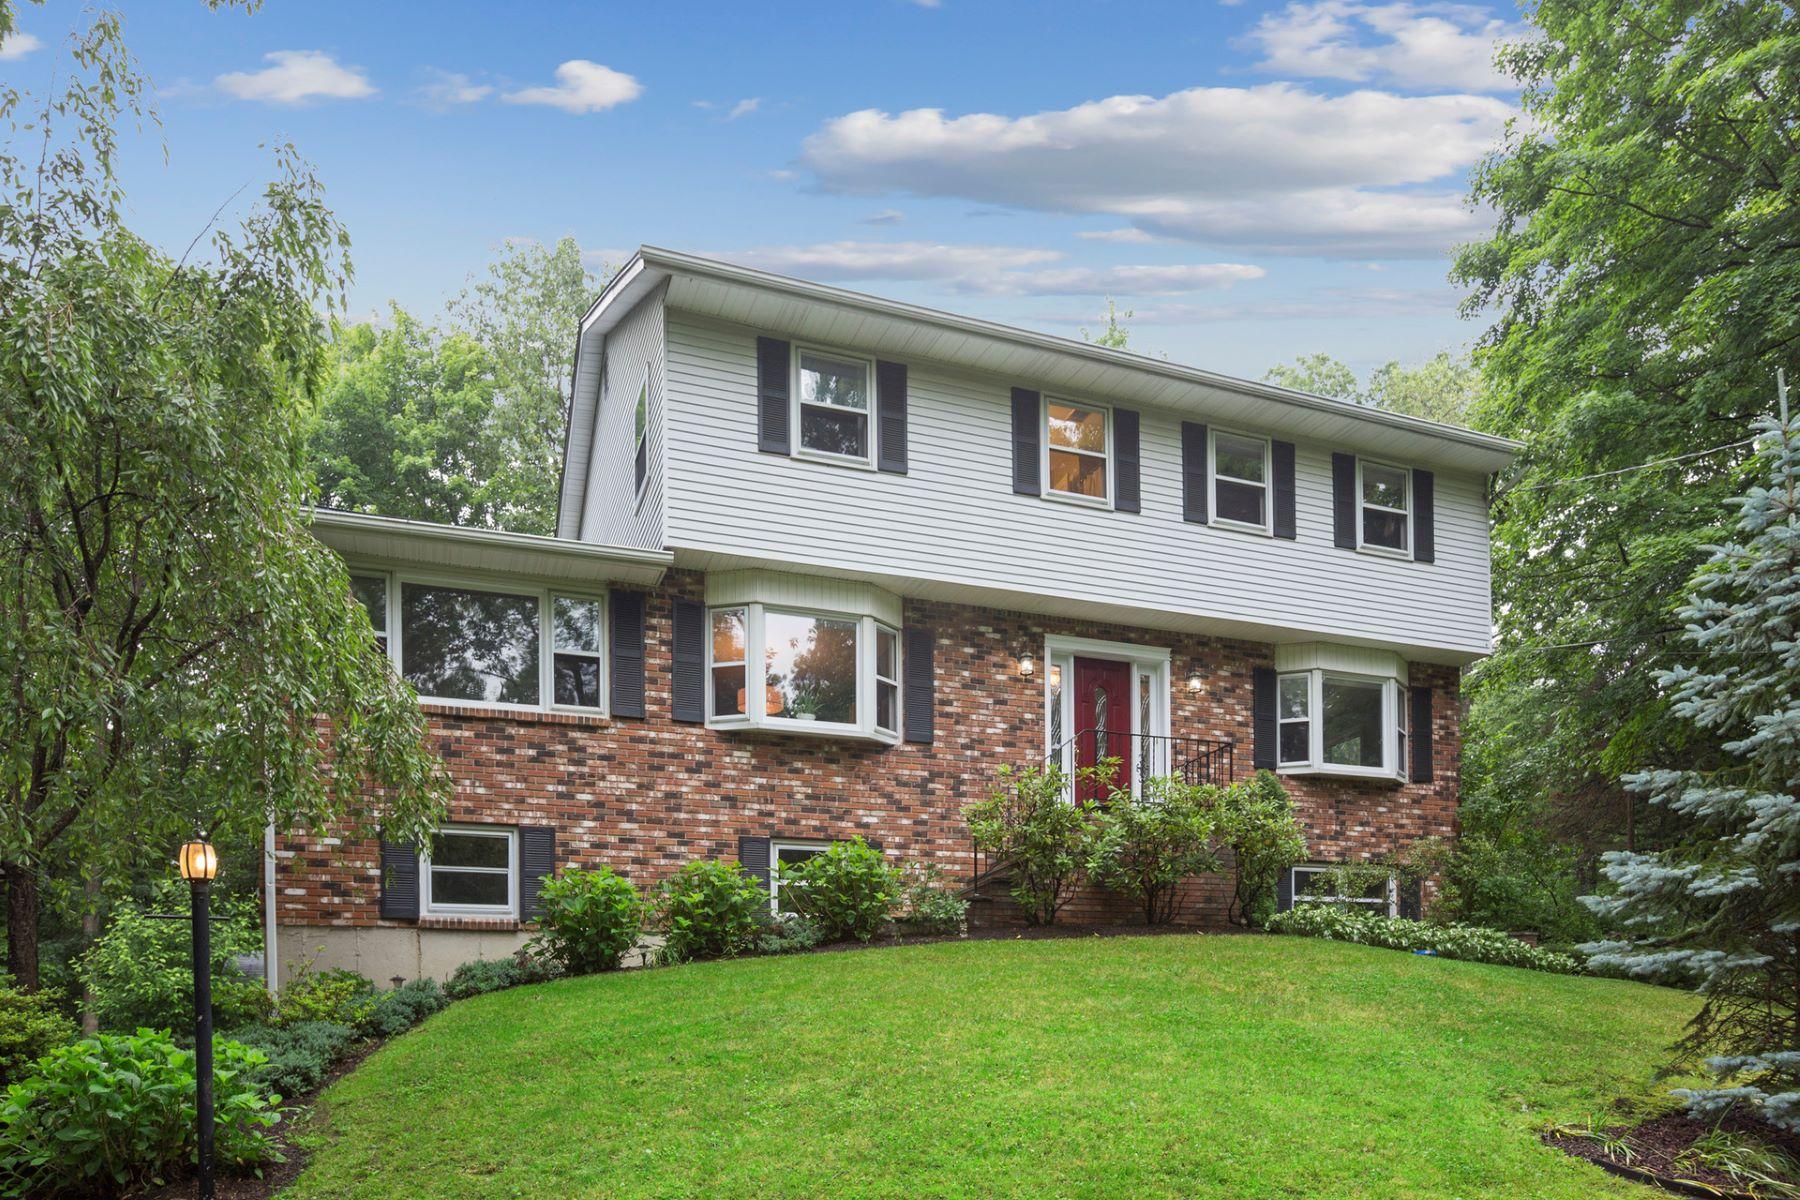 Single Family Homes для того Продажа на Spacious Colonial 113 Chambers Road, Danbury, Коннектикут 06811 Соединенные Штаты